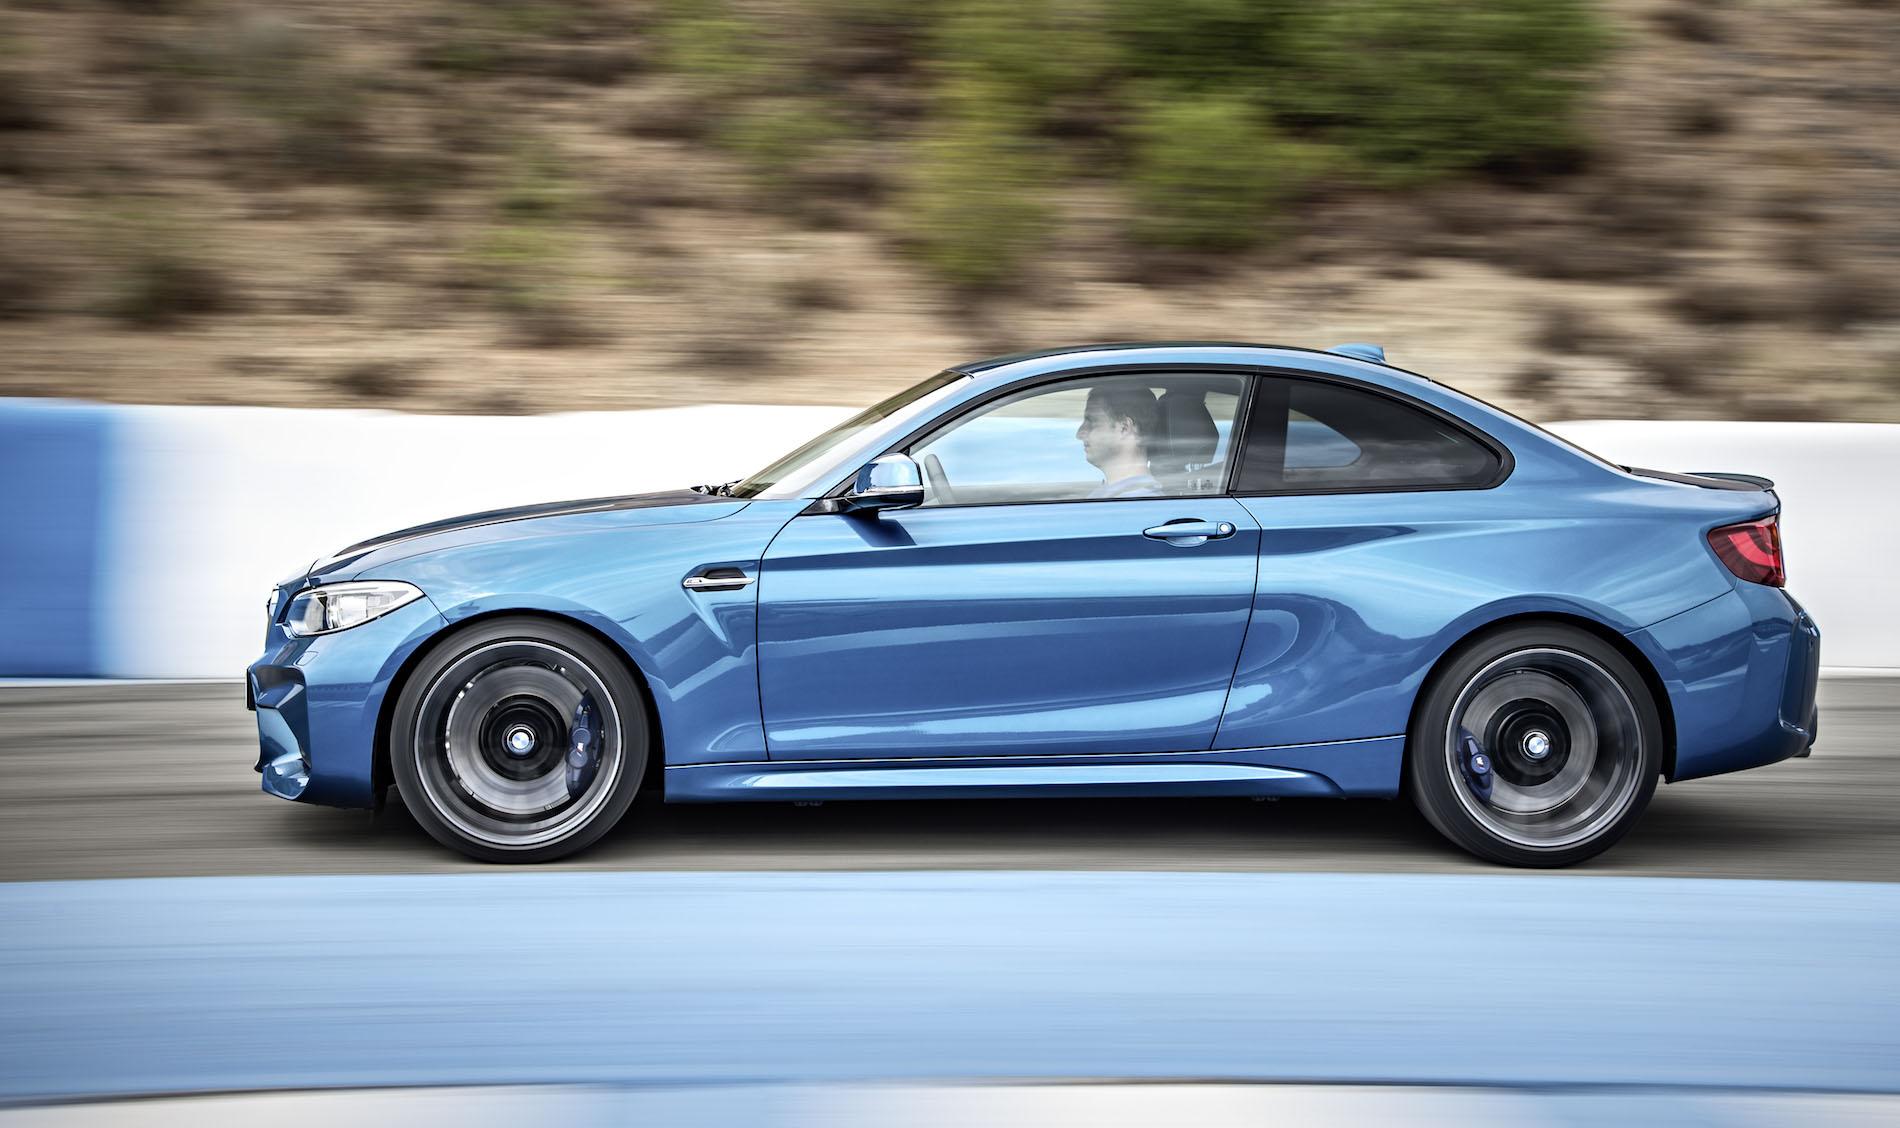 BMW X4  BMW Forum BMW News and BMW Blog  BIMMERPOST